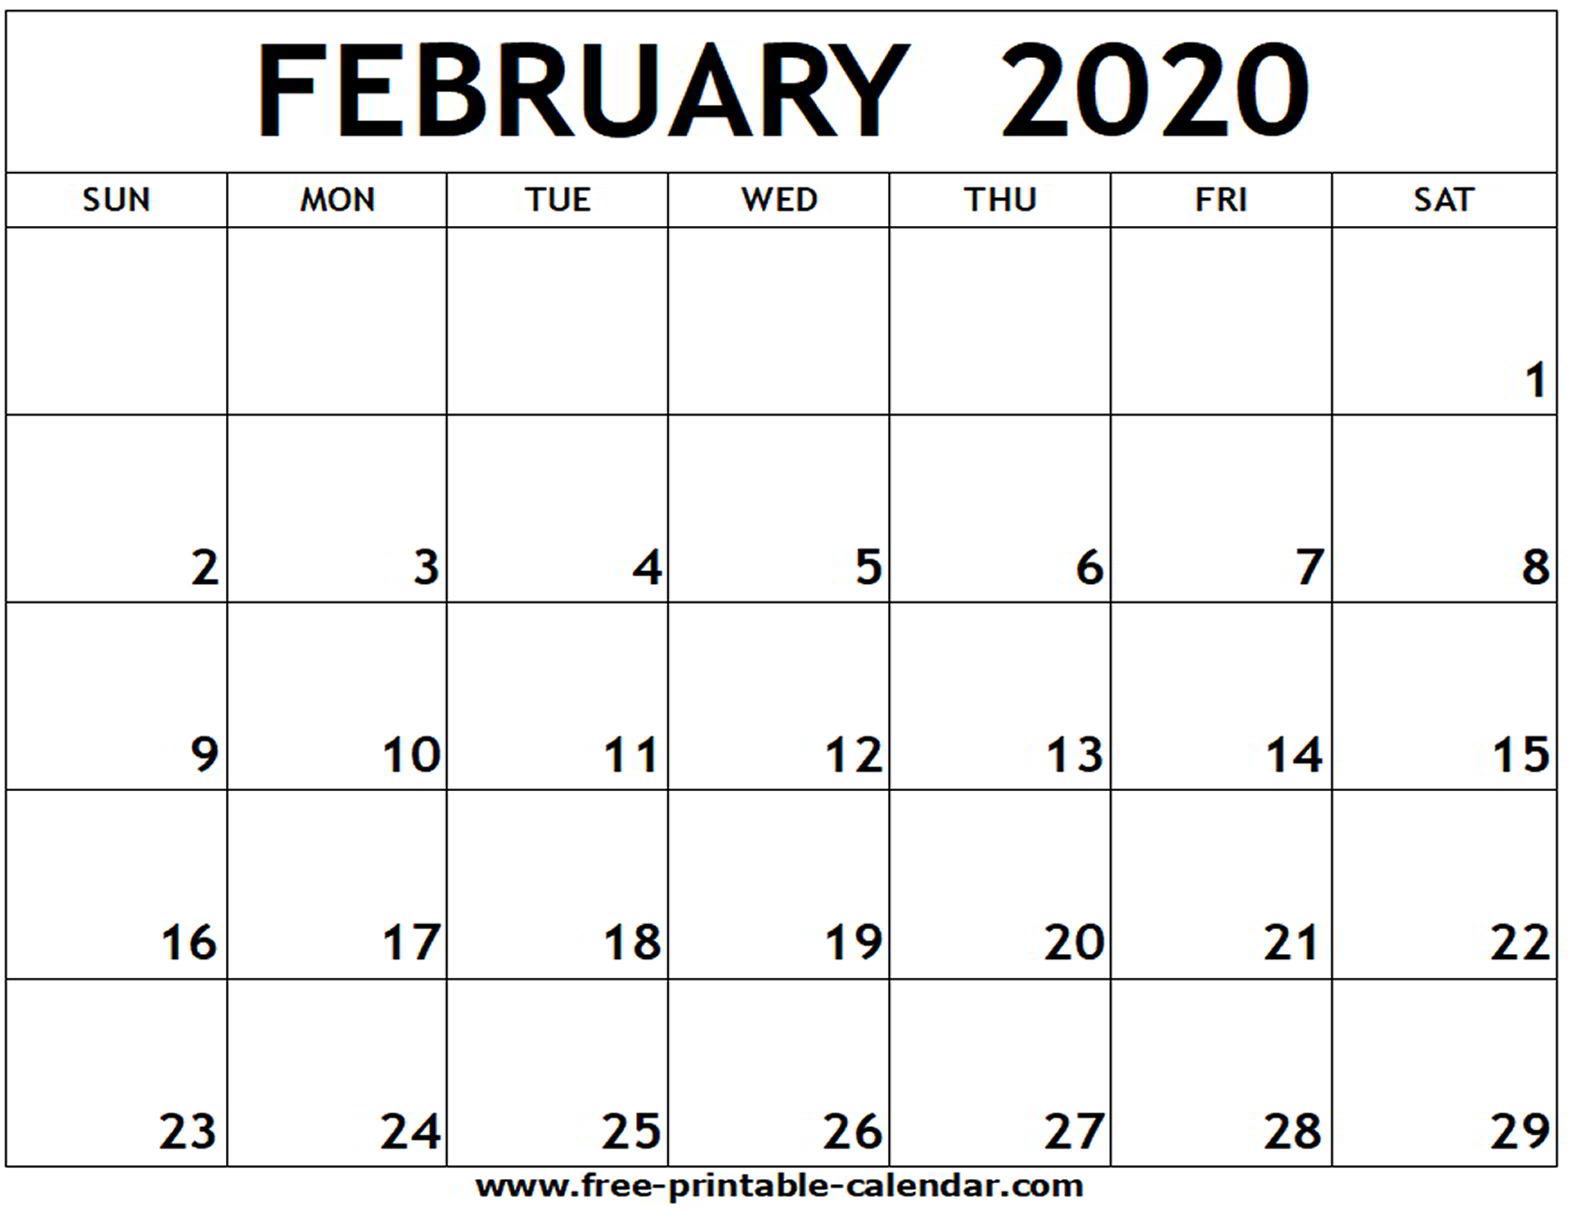 February 2020 Printable Calendar - Free-Printable-Calendar with 2020 Calendar I Can Edit